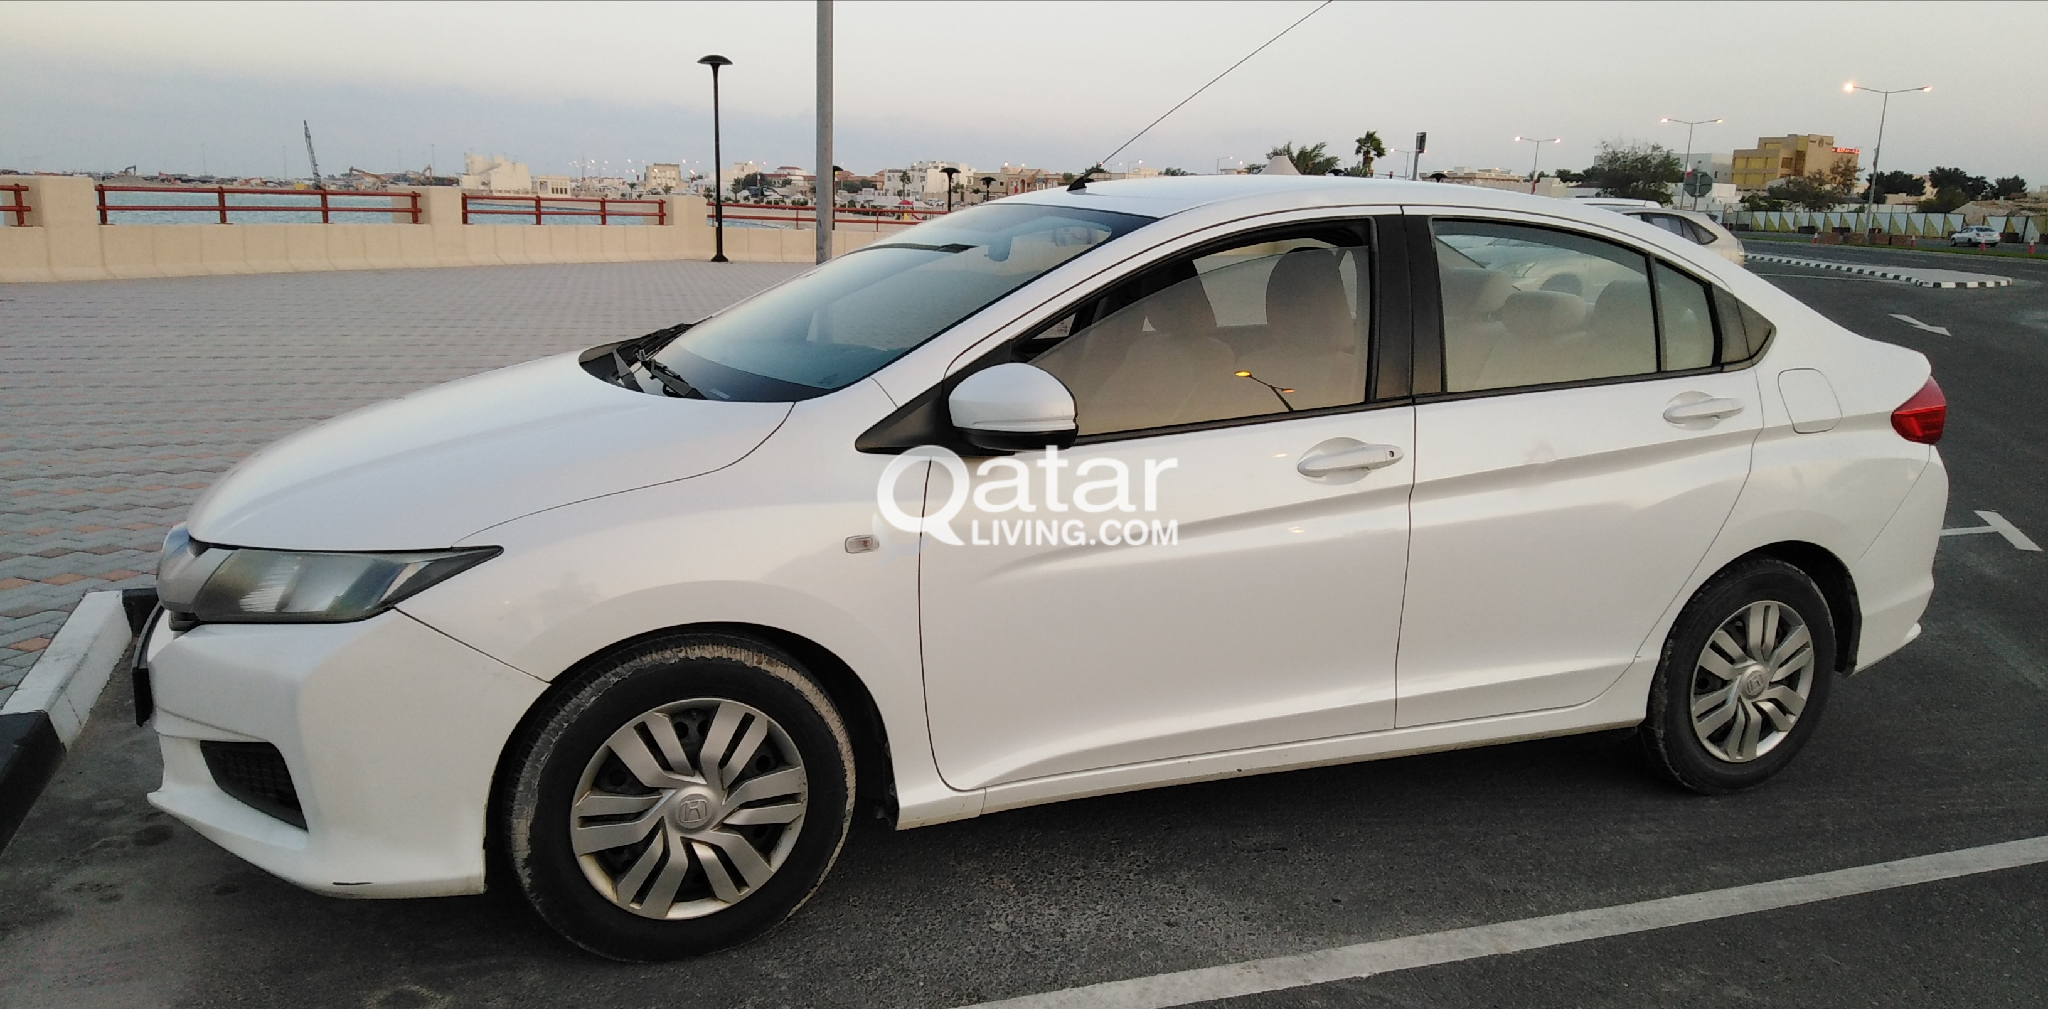 Honda city 2014 model, Low mileage | Qatar Living